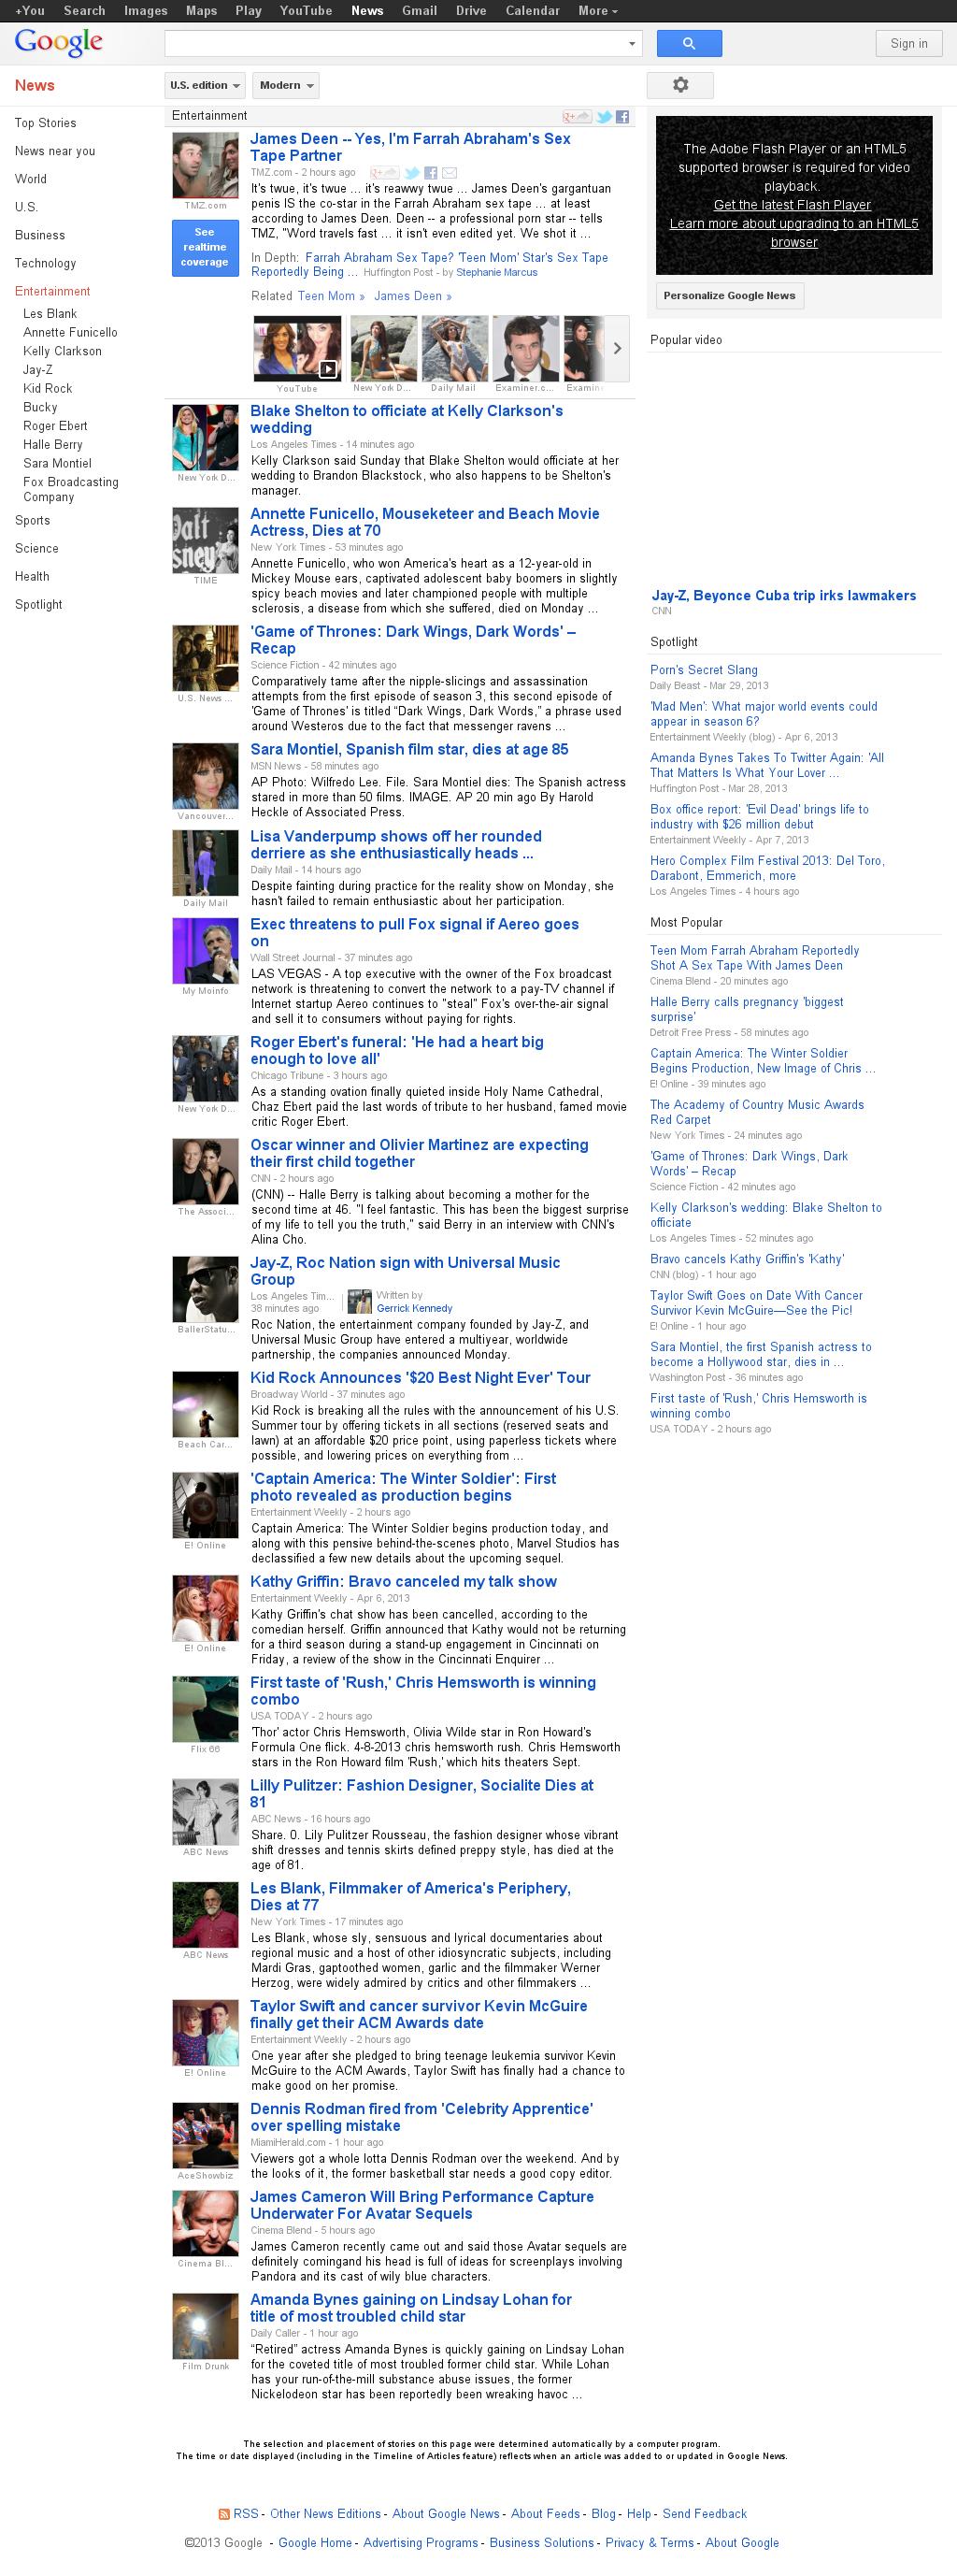 Google News: Entertainment at Monday April 8, 2013, 8:19 p.m. UTC